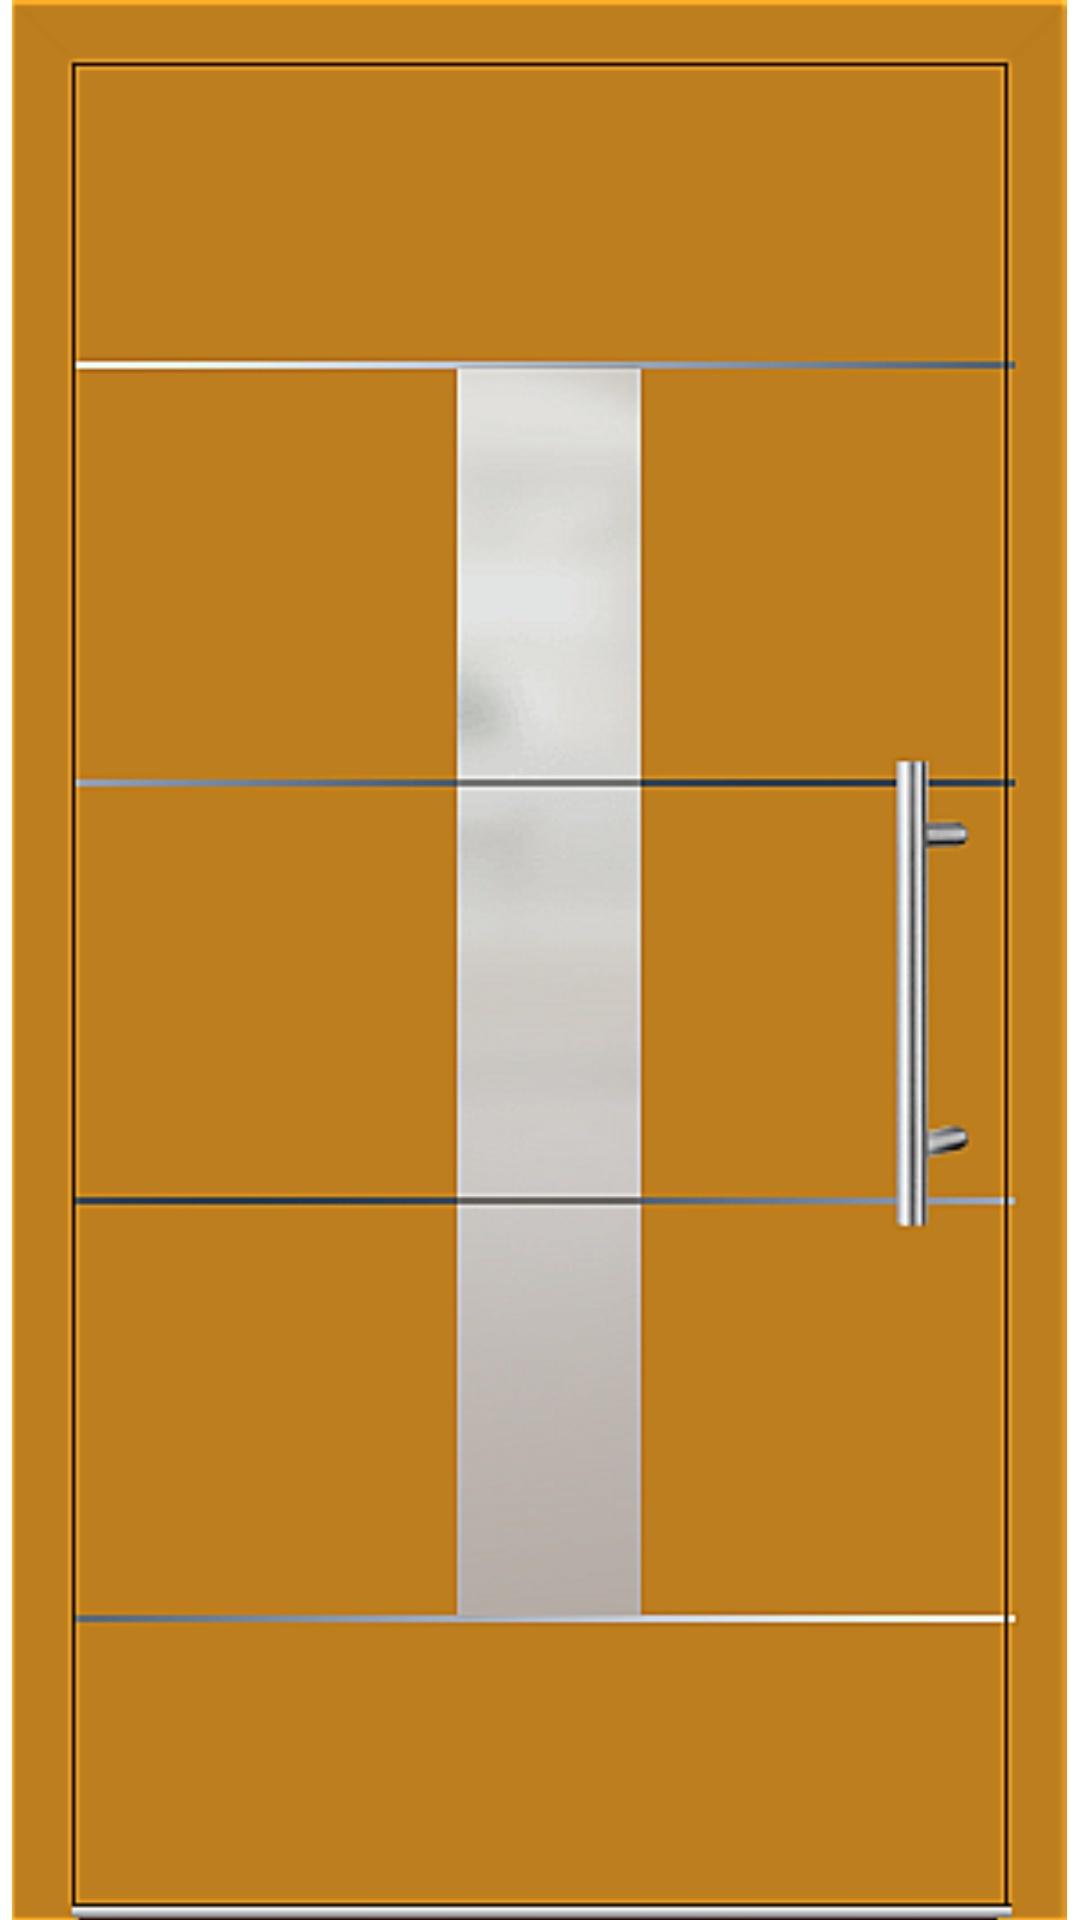 Kunststoff Haustür Modell 6184-54 honiggelb